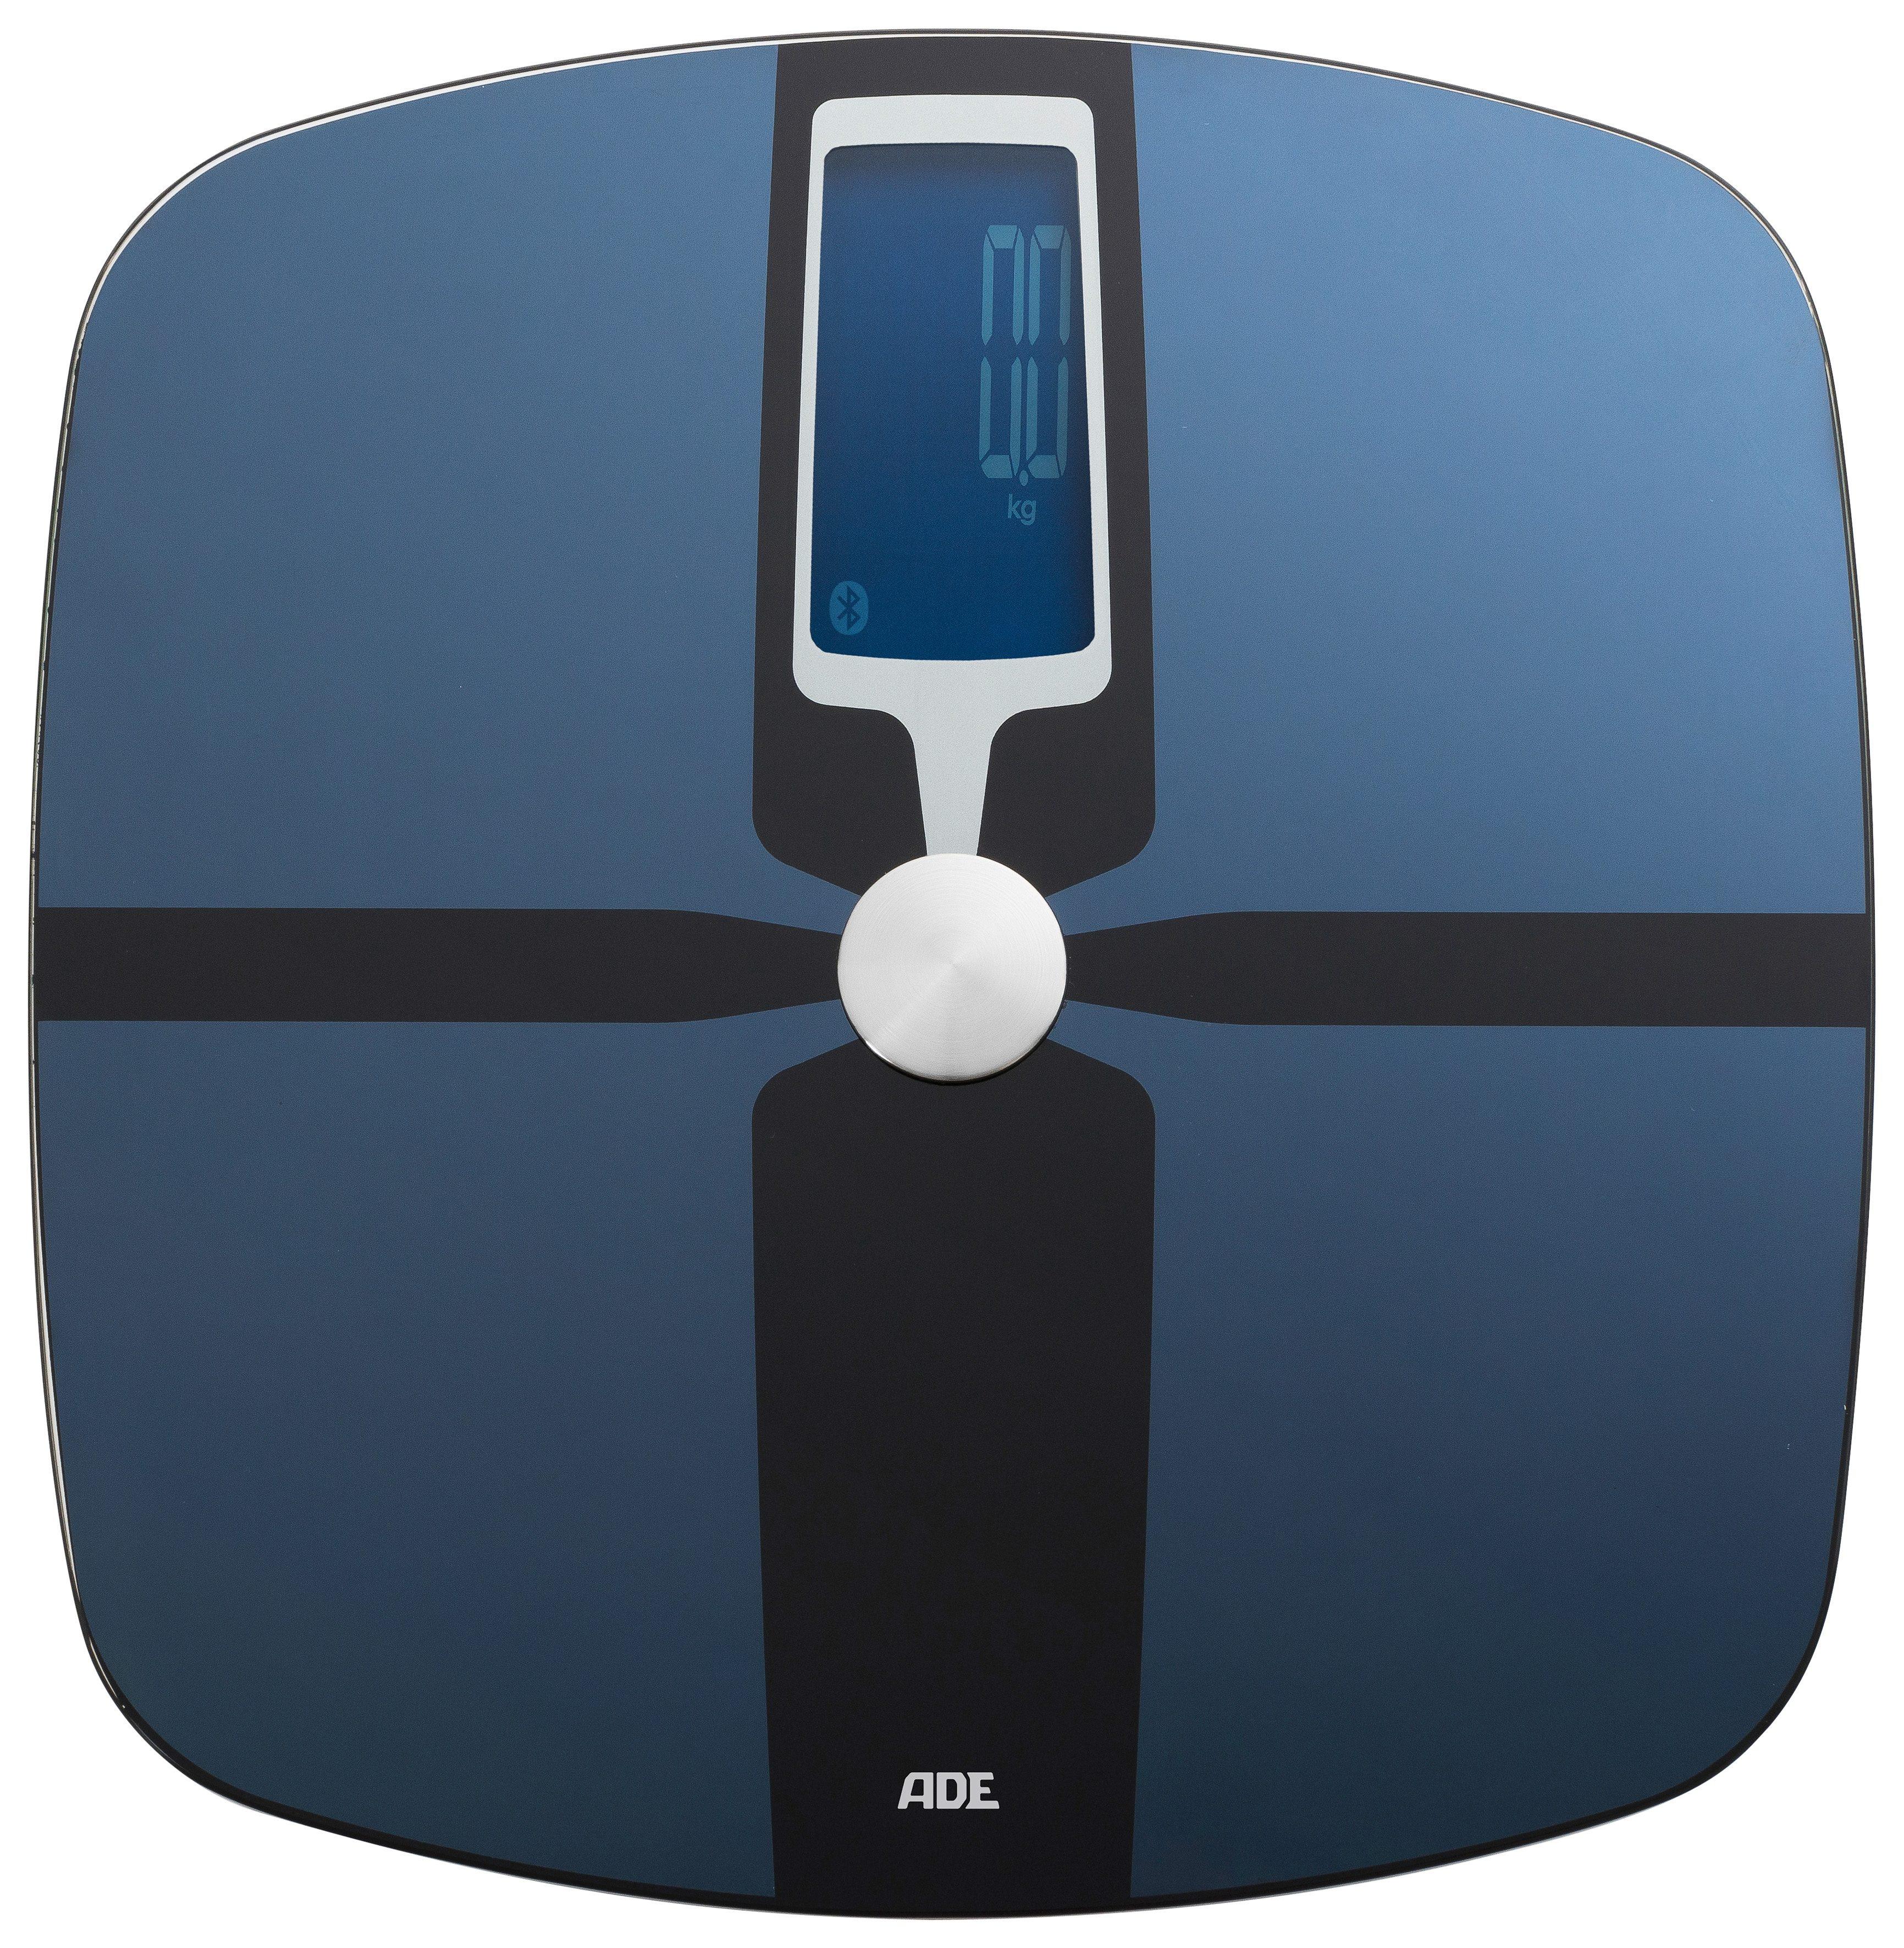 ADE Digitale Körperanalysewaage BA 1400 Vital Analysis